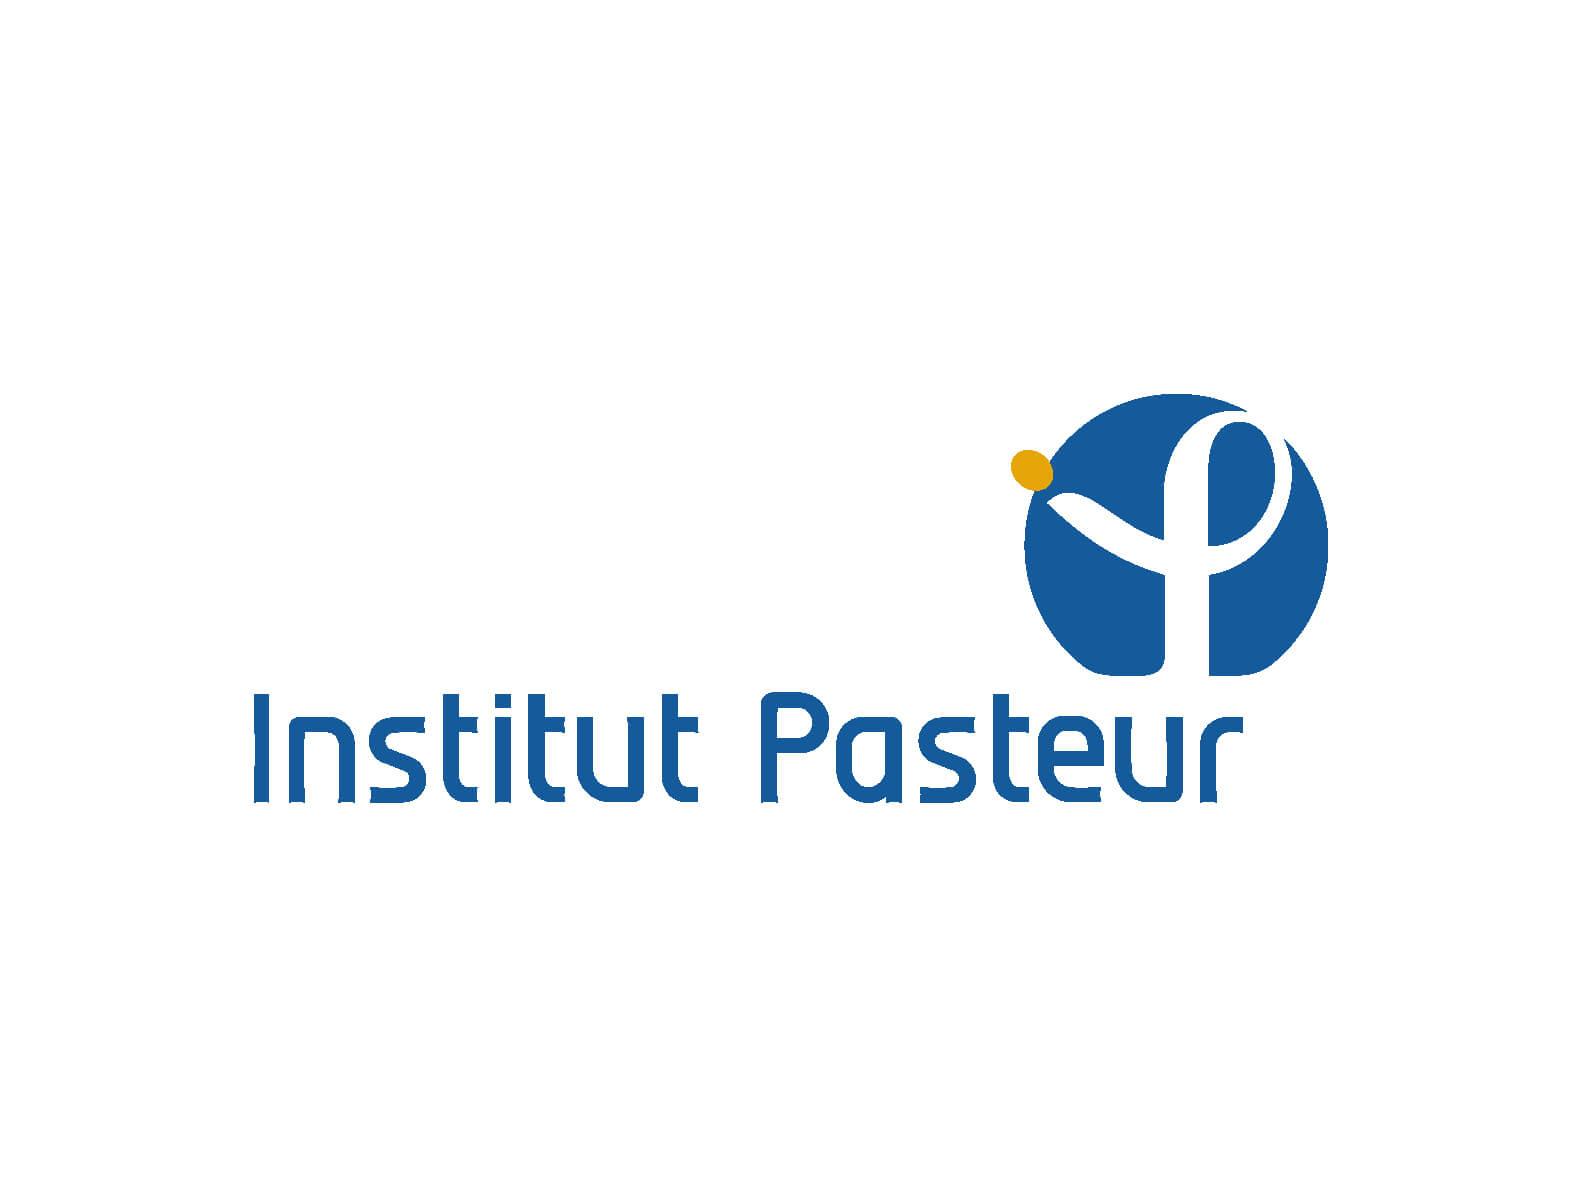 agence kayak communication web lille nord institut pasteur logo